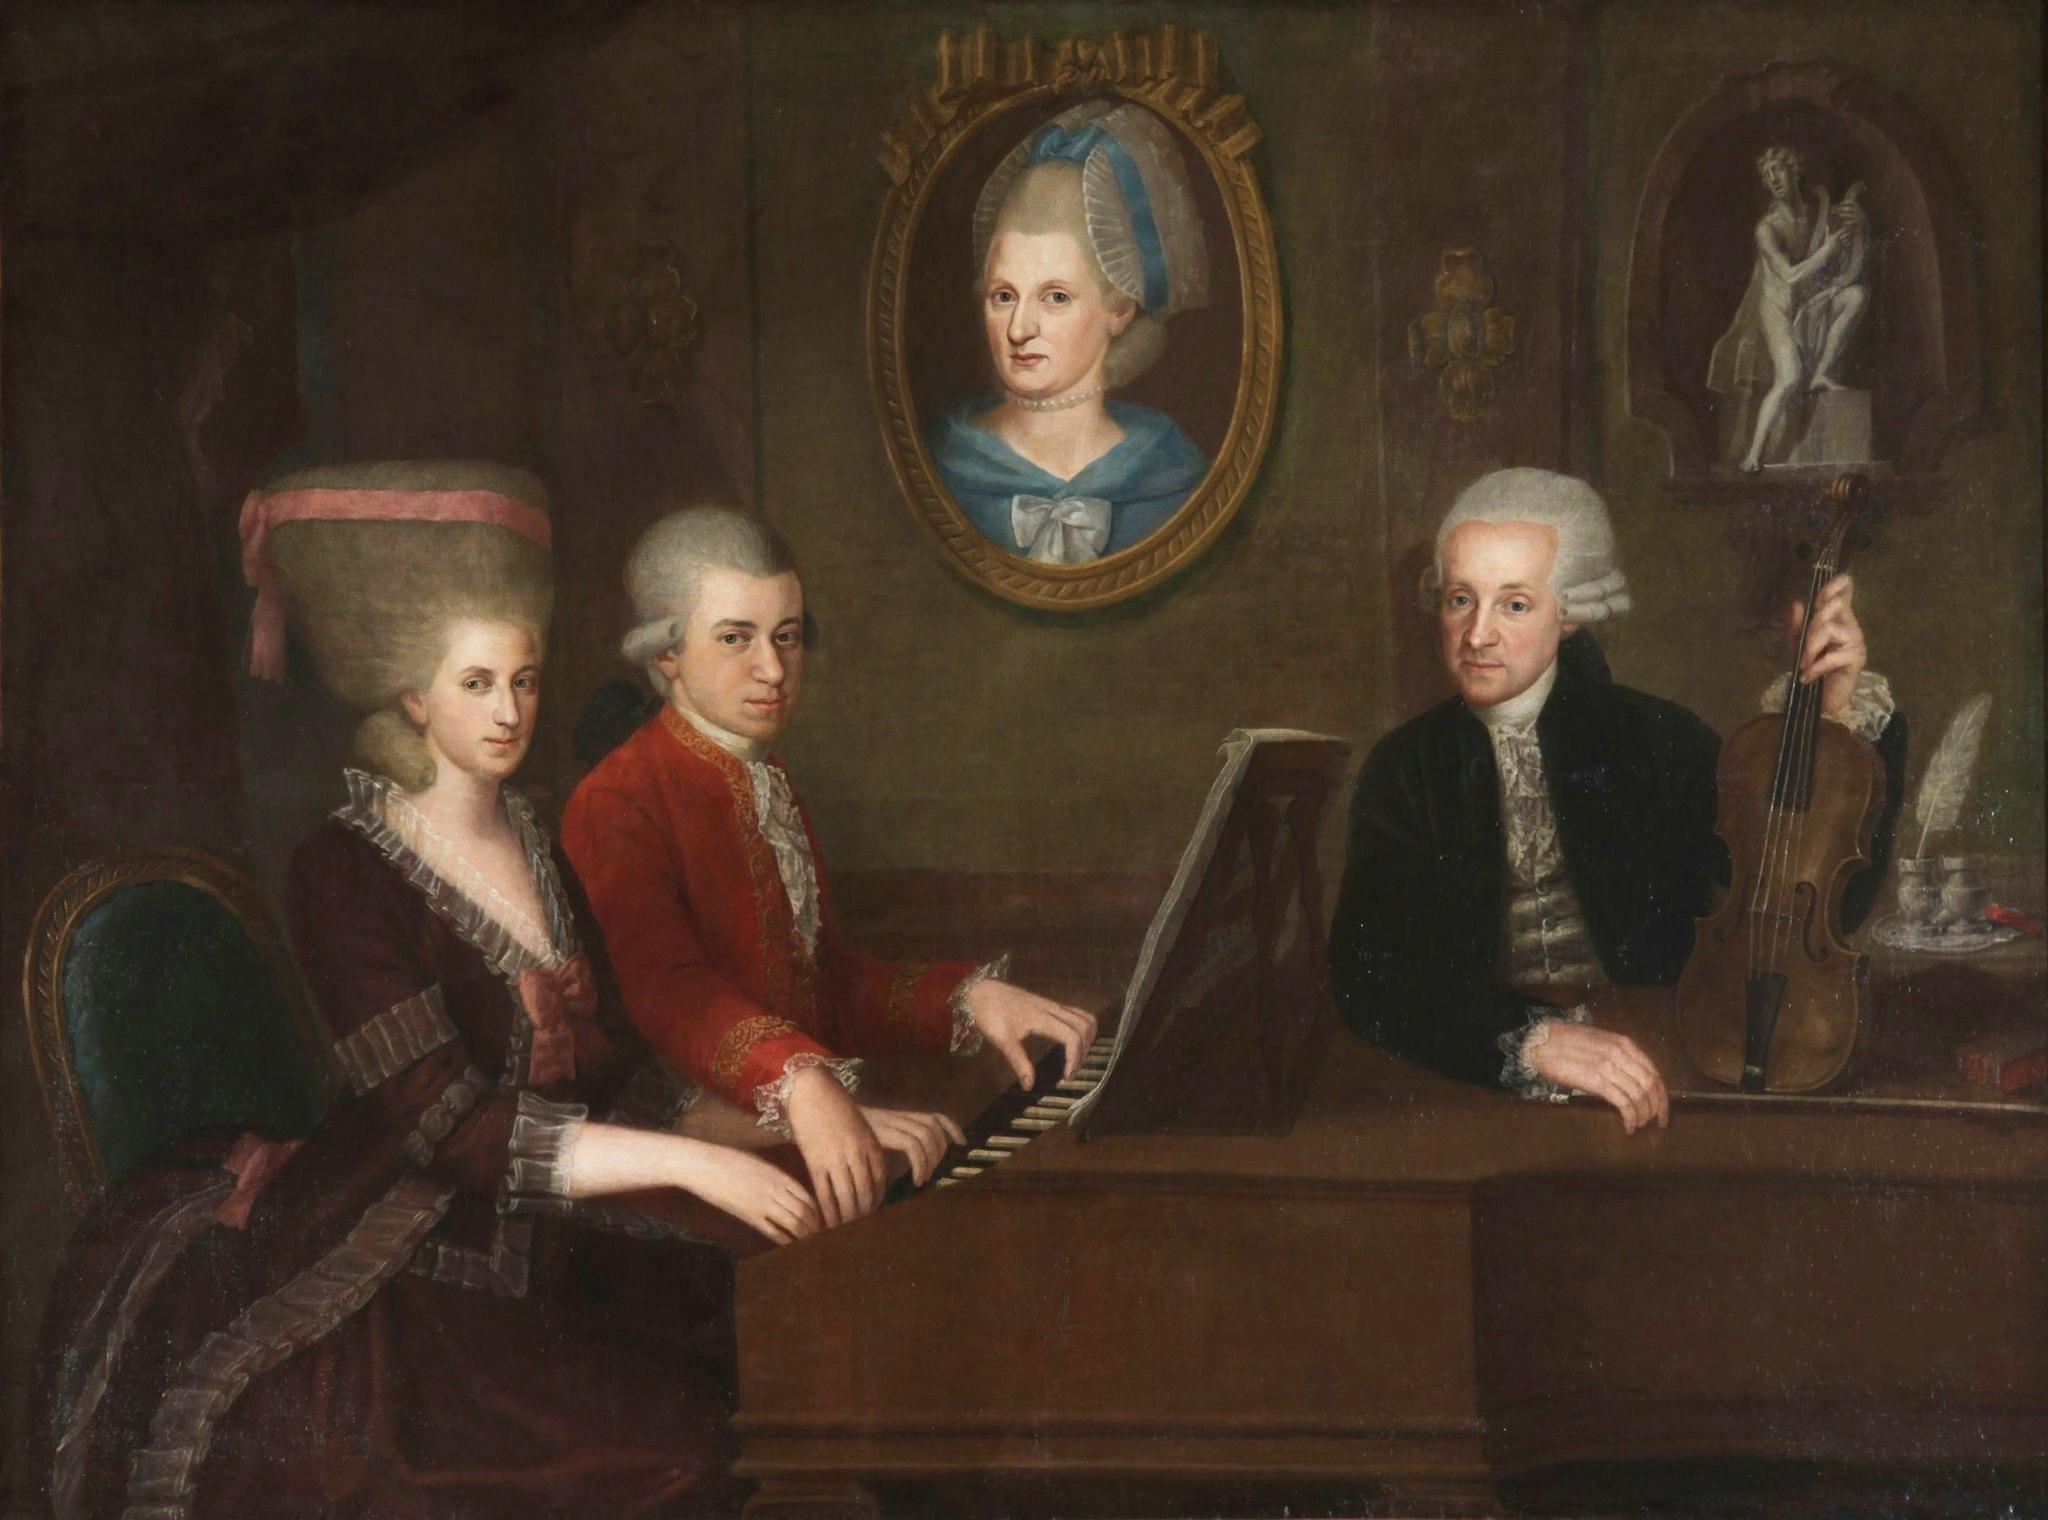 Family portrait, circa 1780: Maria Anna (